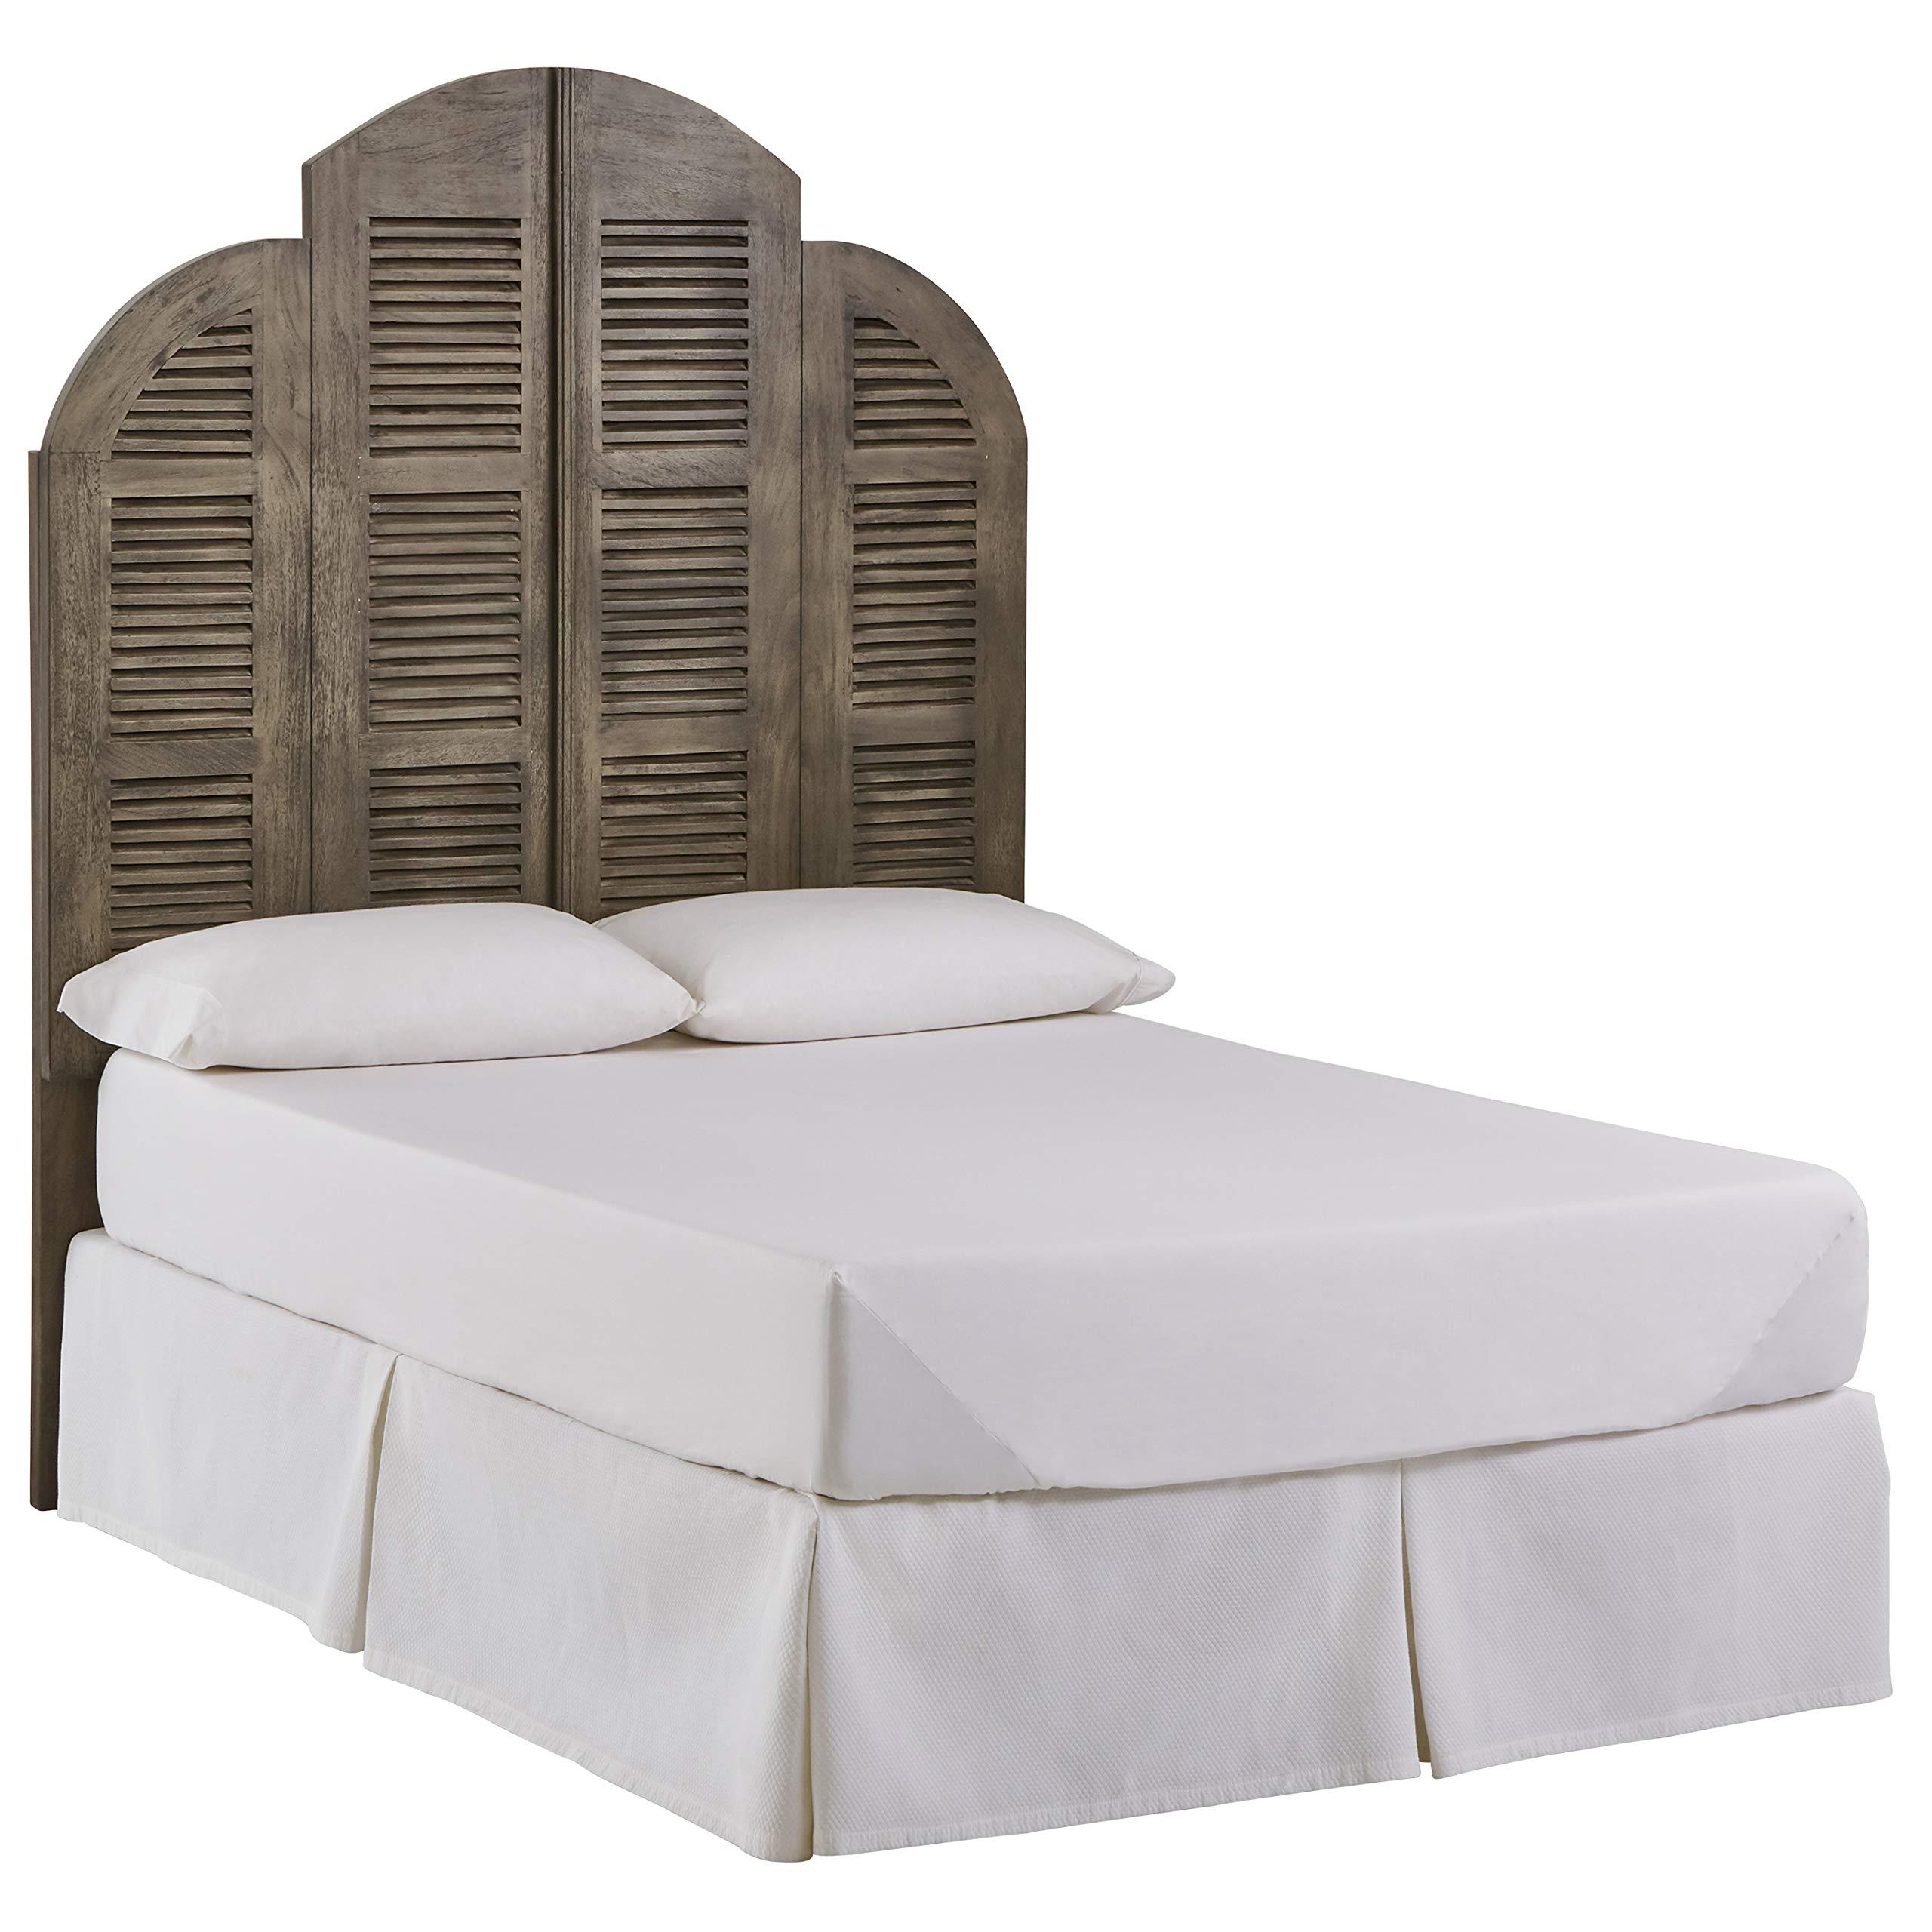 Stone & Beam Lyla Rustic Slat Bed Headboard - Queen, 64 Inch, China Gray by Stone   & Beam